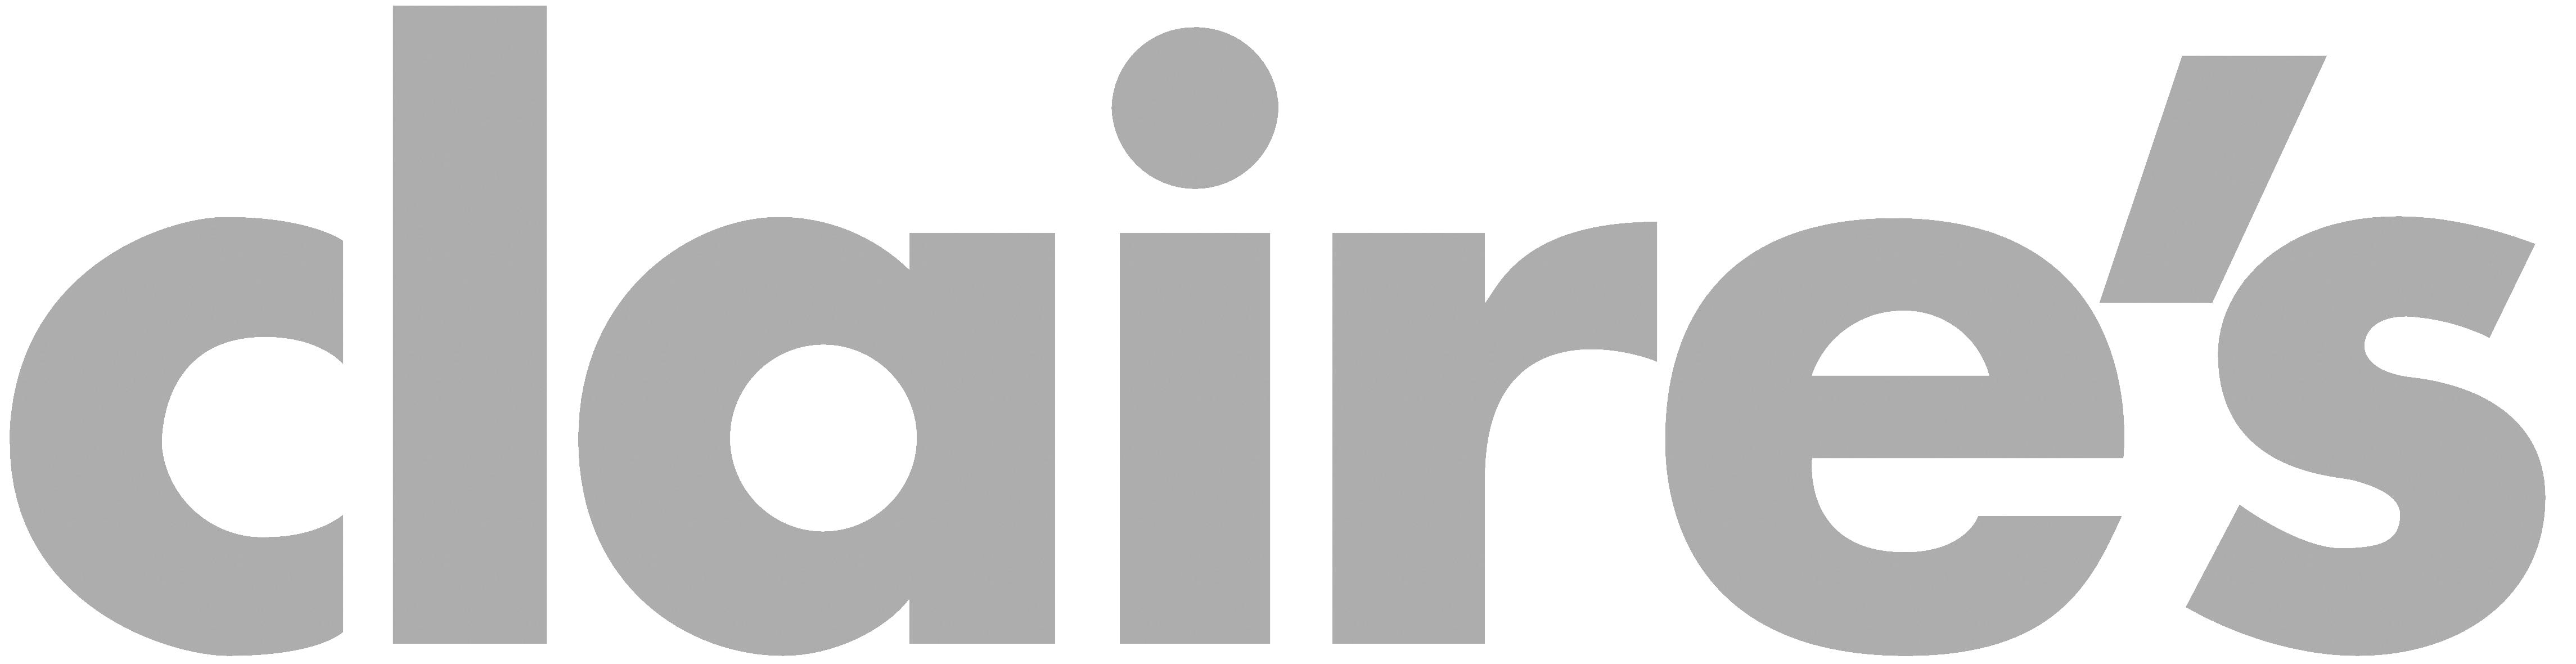 Magecart Attack - Claire's logo